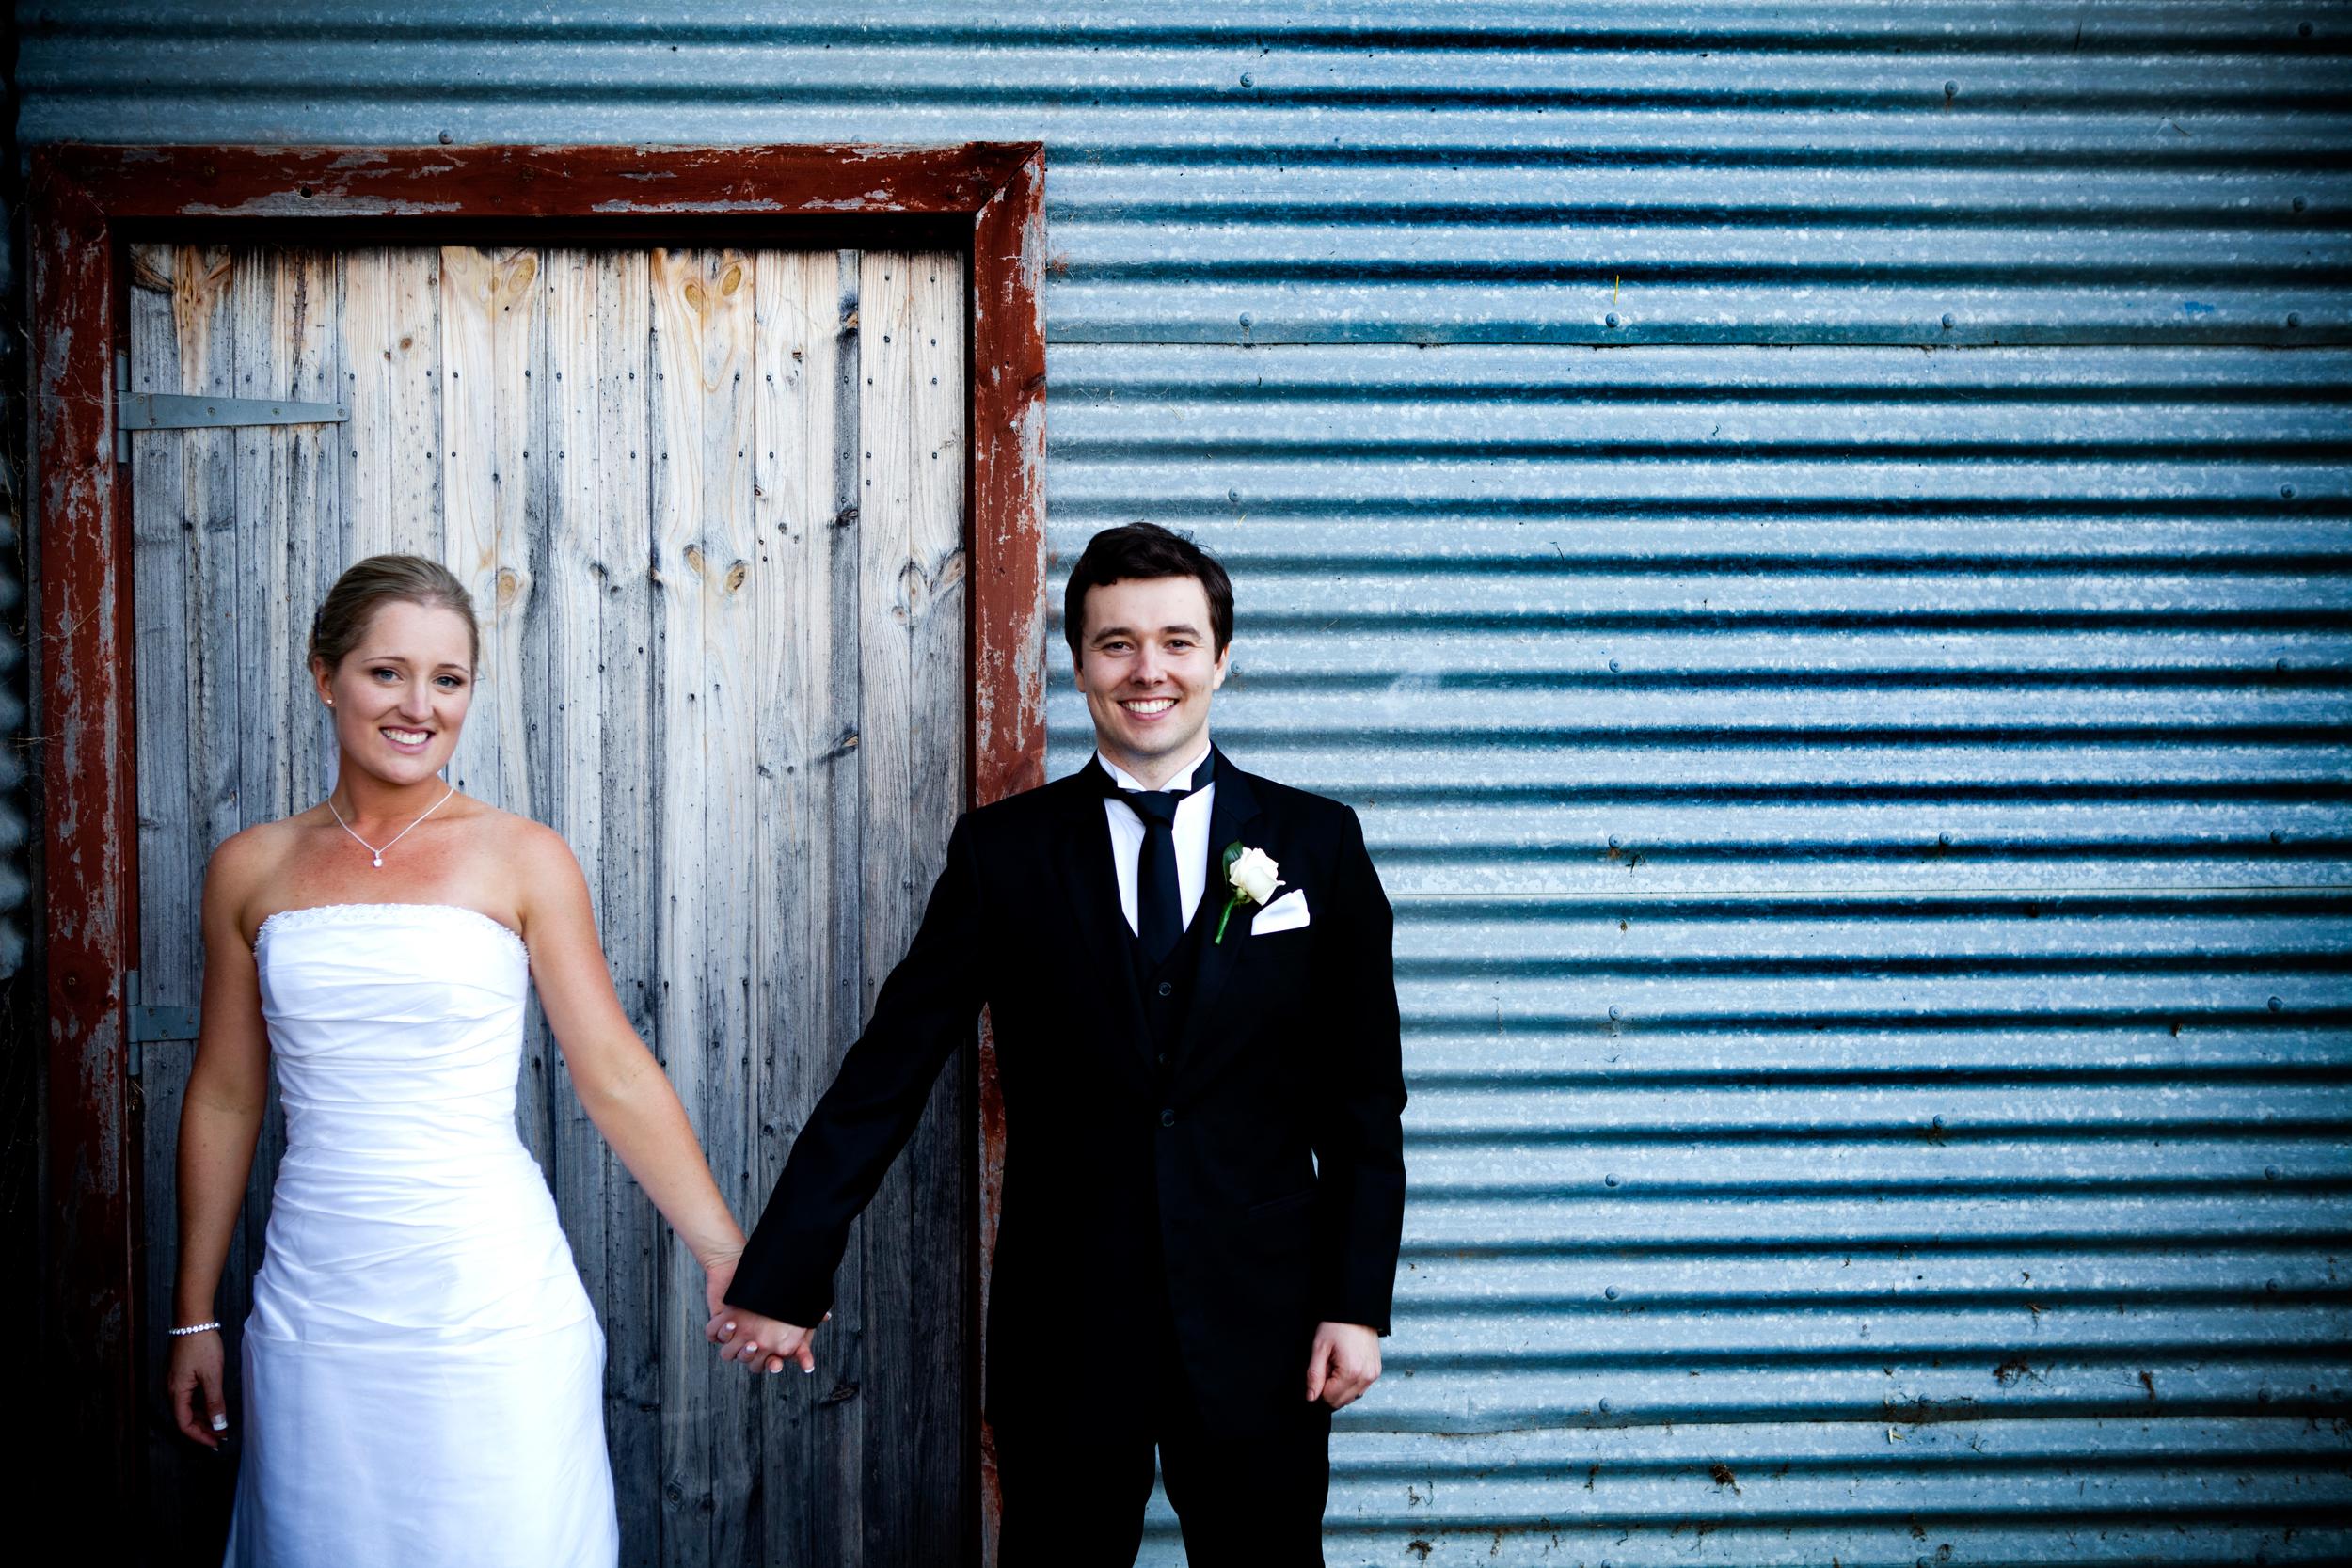 Canberra wedding photography - Yarralumla Woolshed